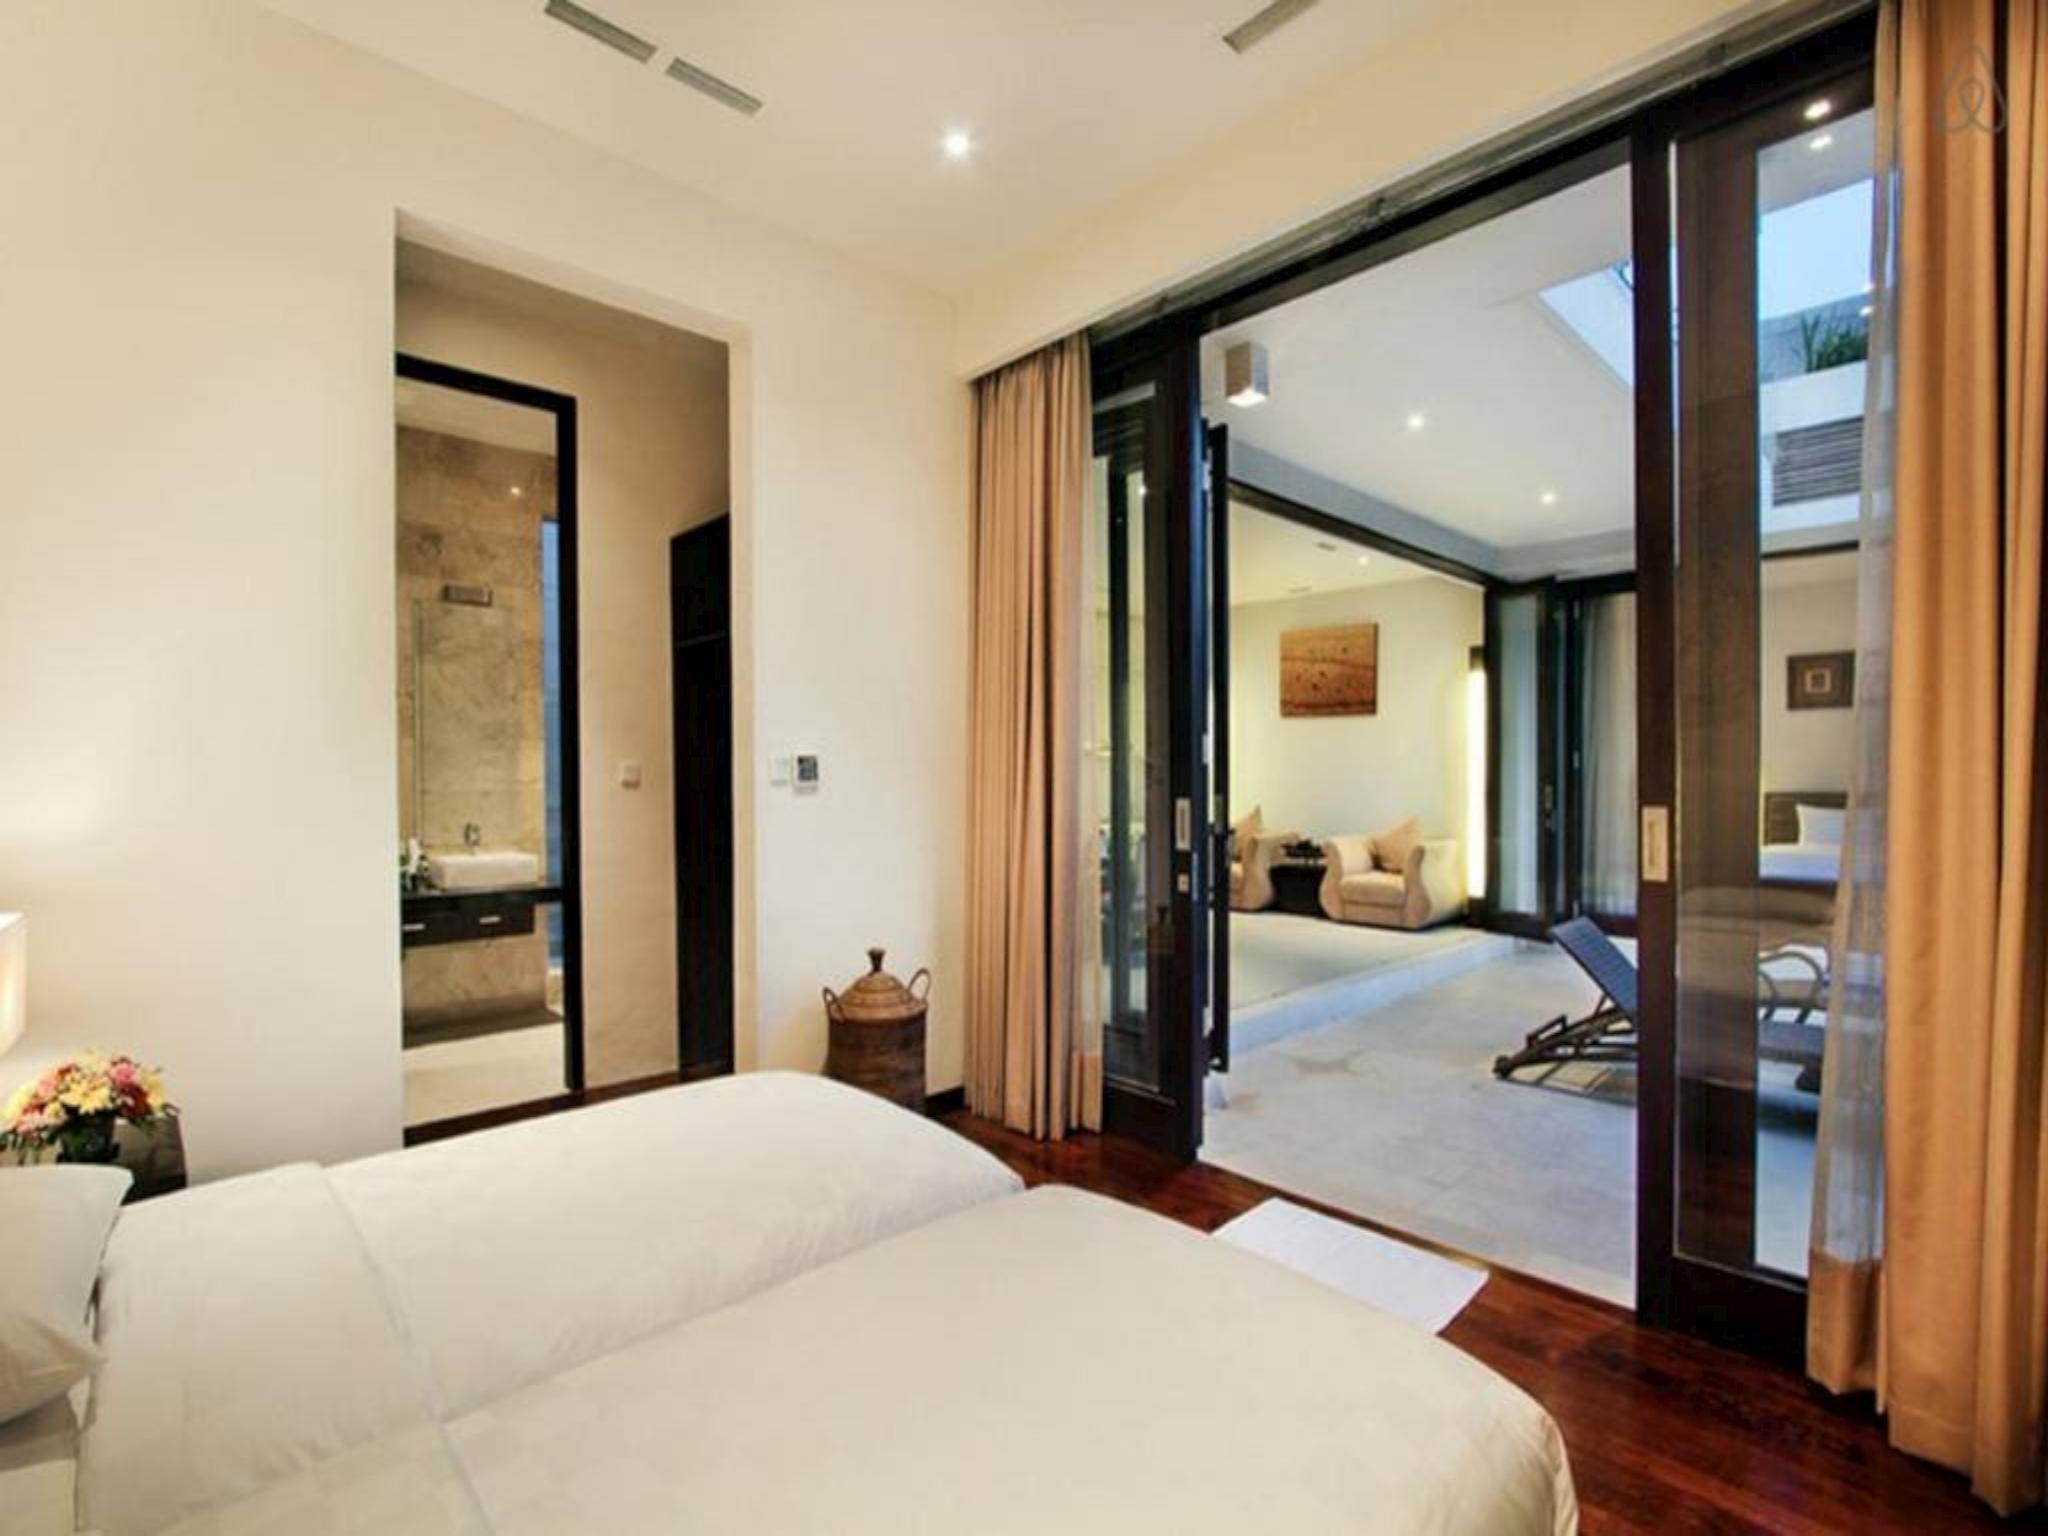 2 BDR Villa Portsea Seminyak